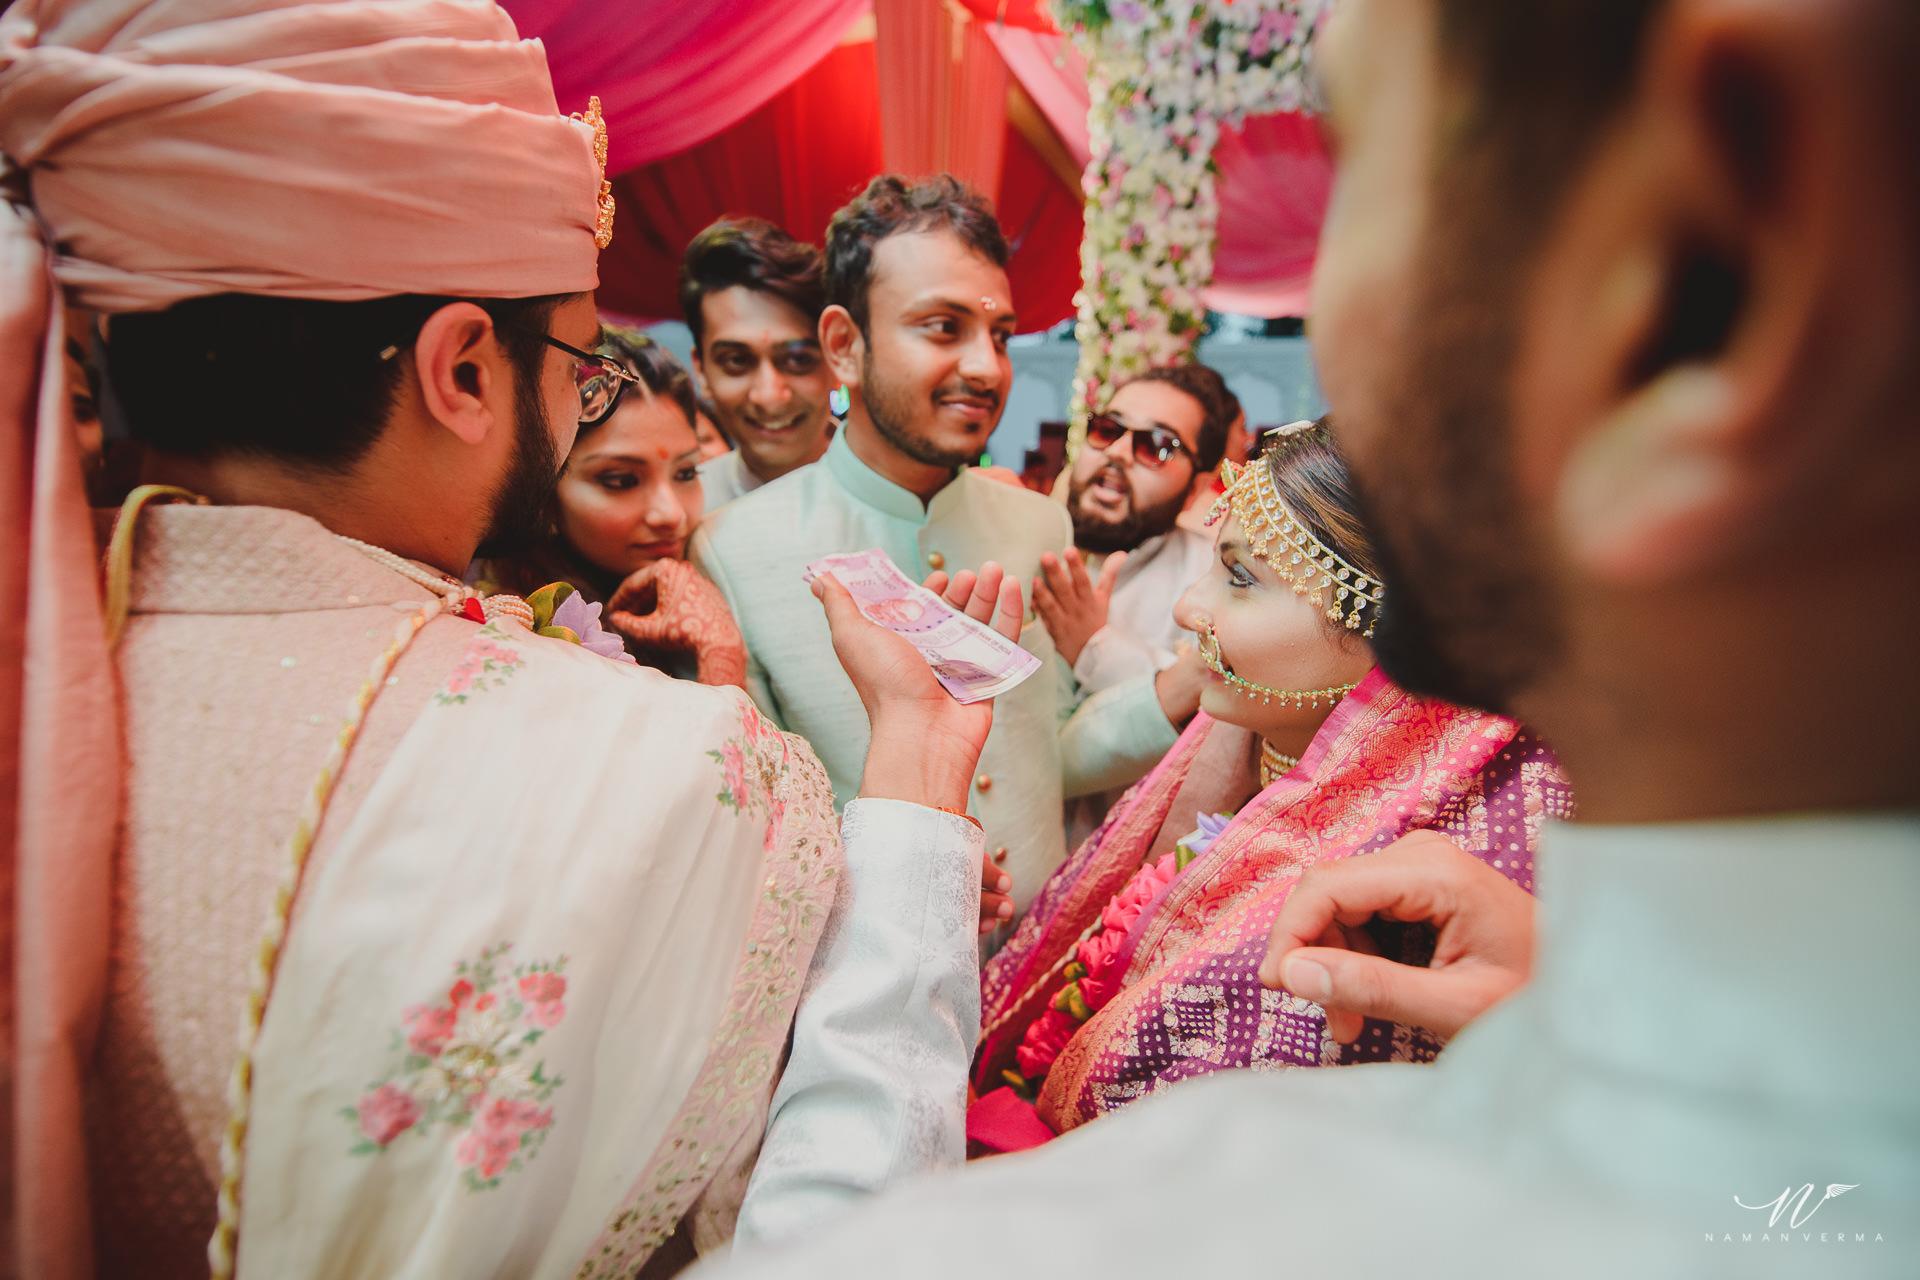 NVP_Vidhi&Rushang_Wedding_764.jpg